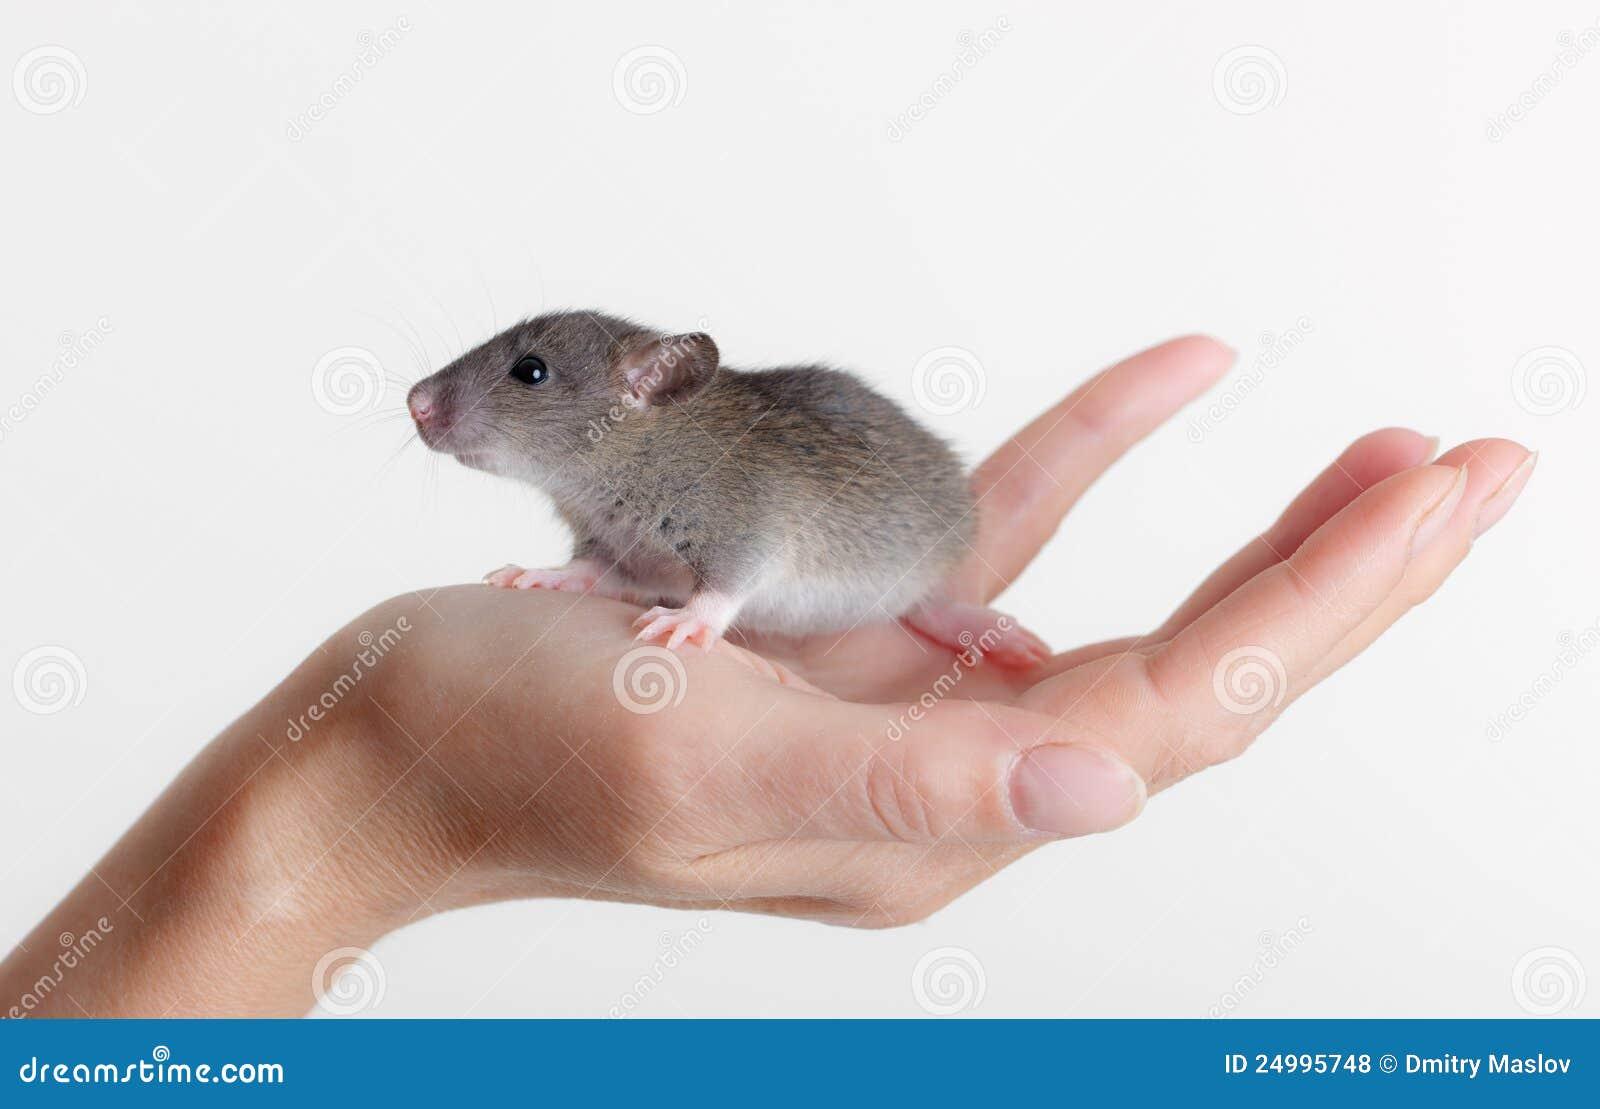 крыса лижет руки